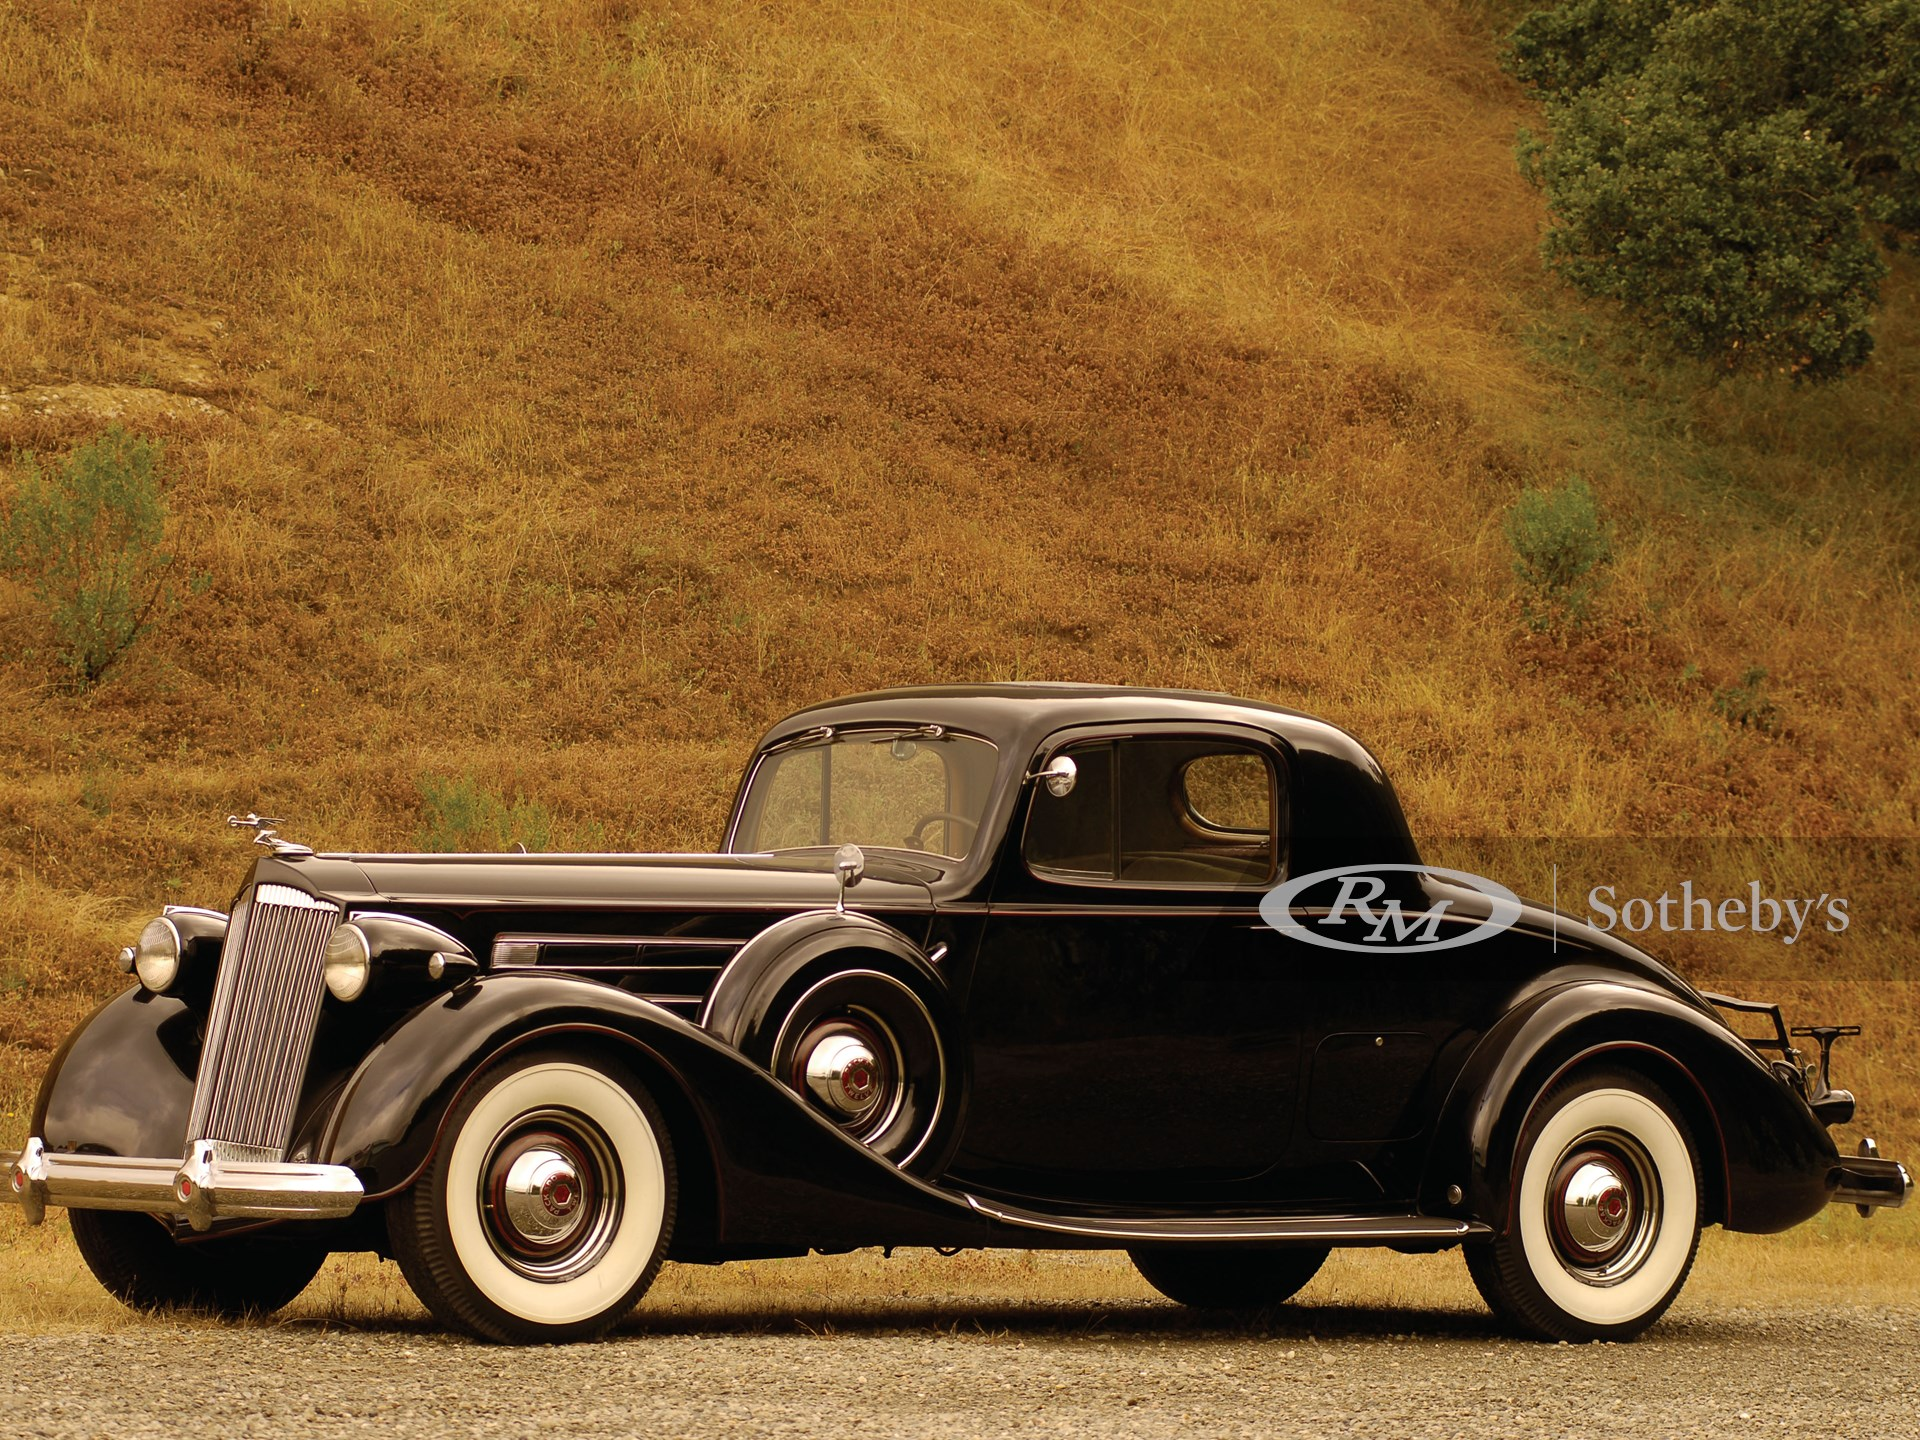 1937 Packard Twelve Rumble Seat Coupe